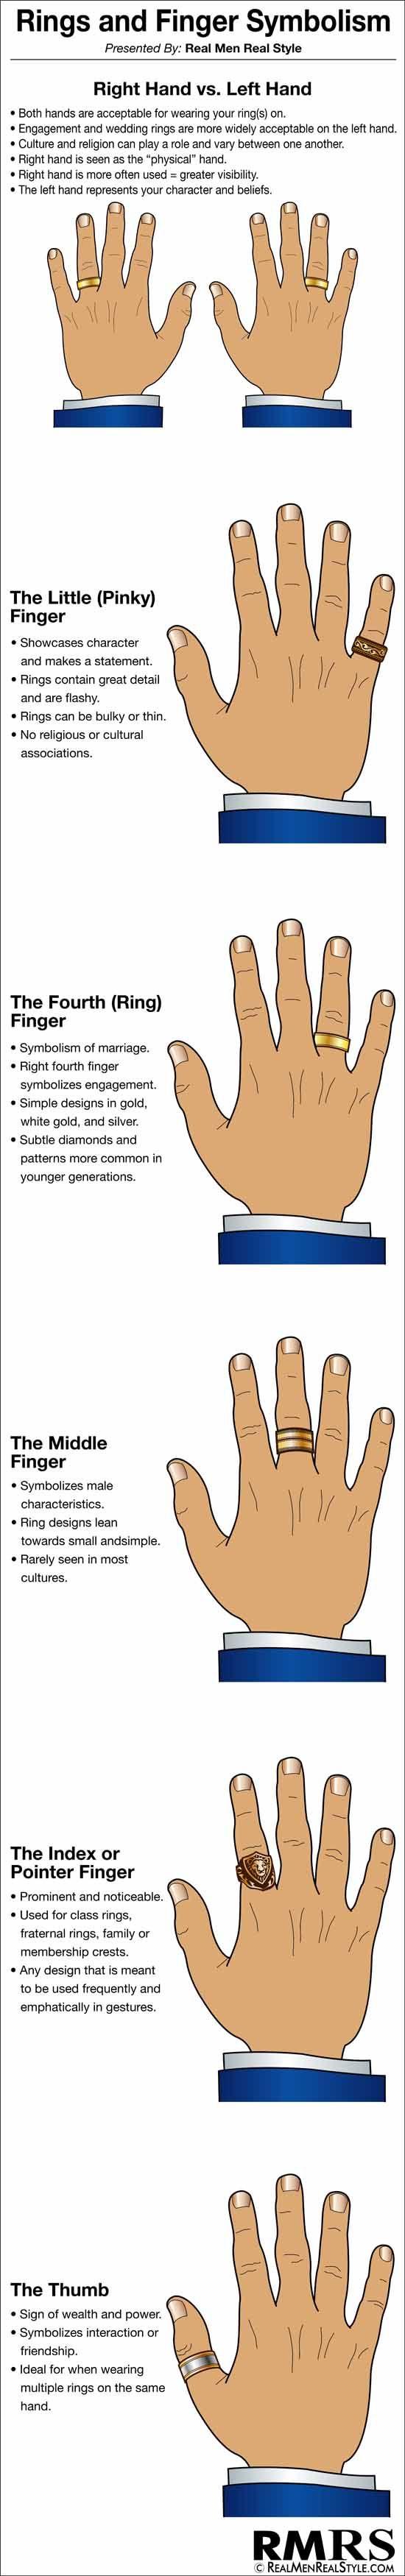 Ring Finger & Symbolism Infographic